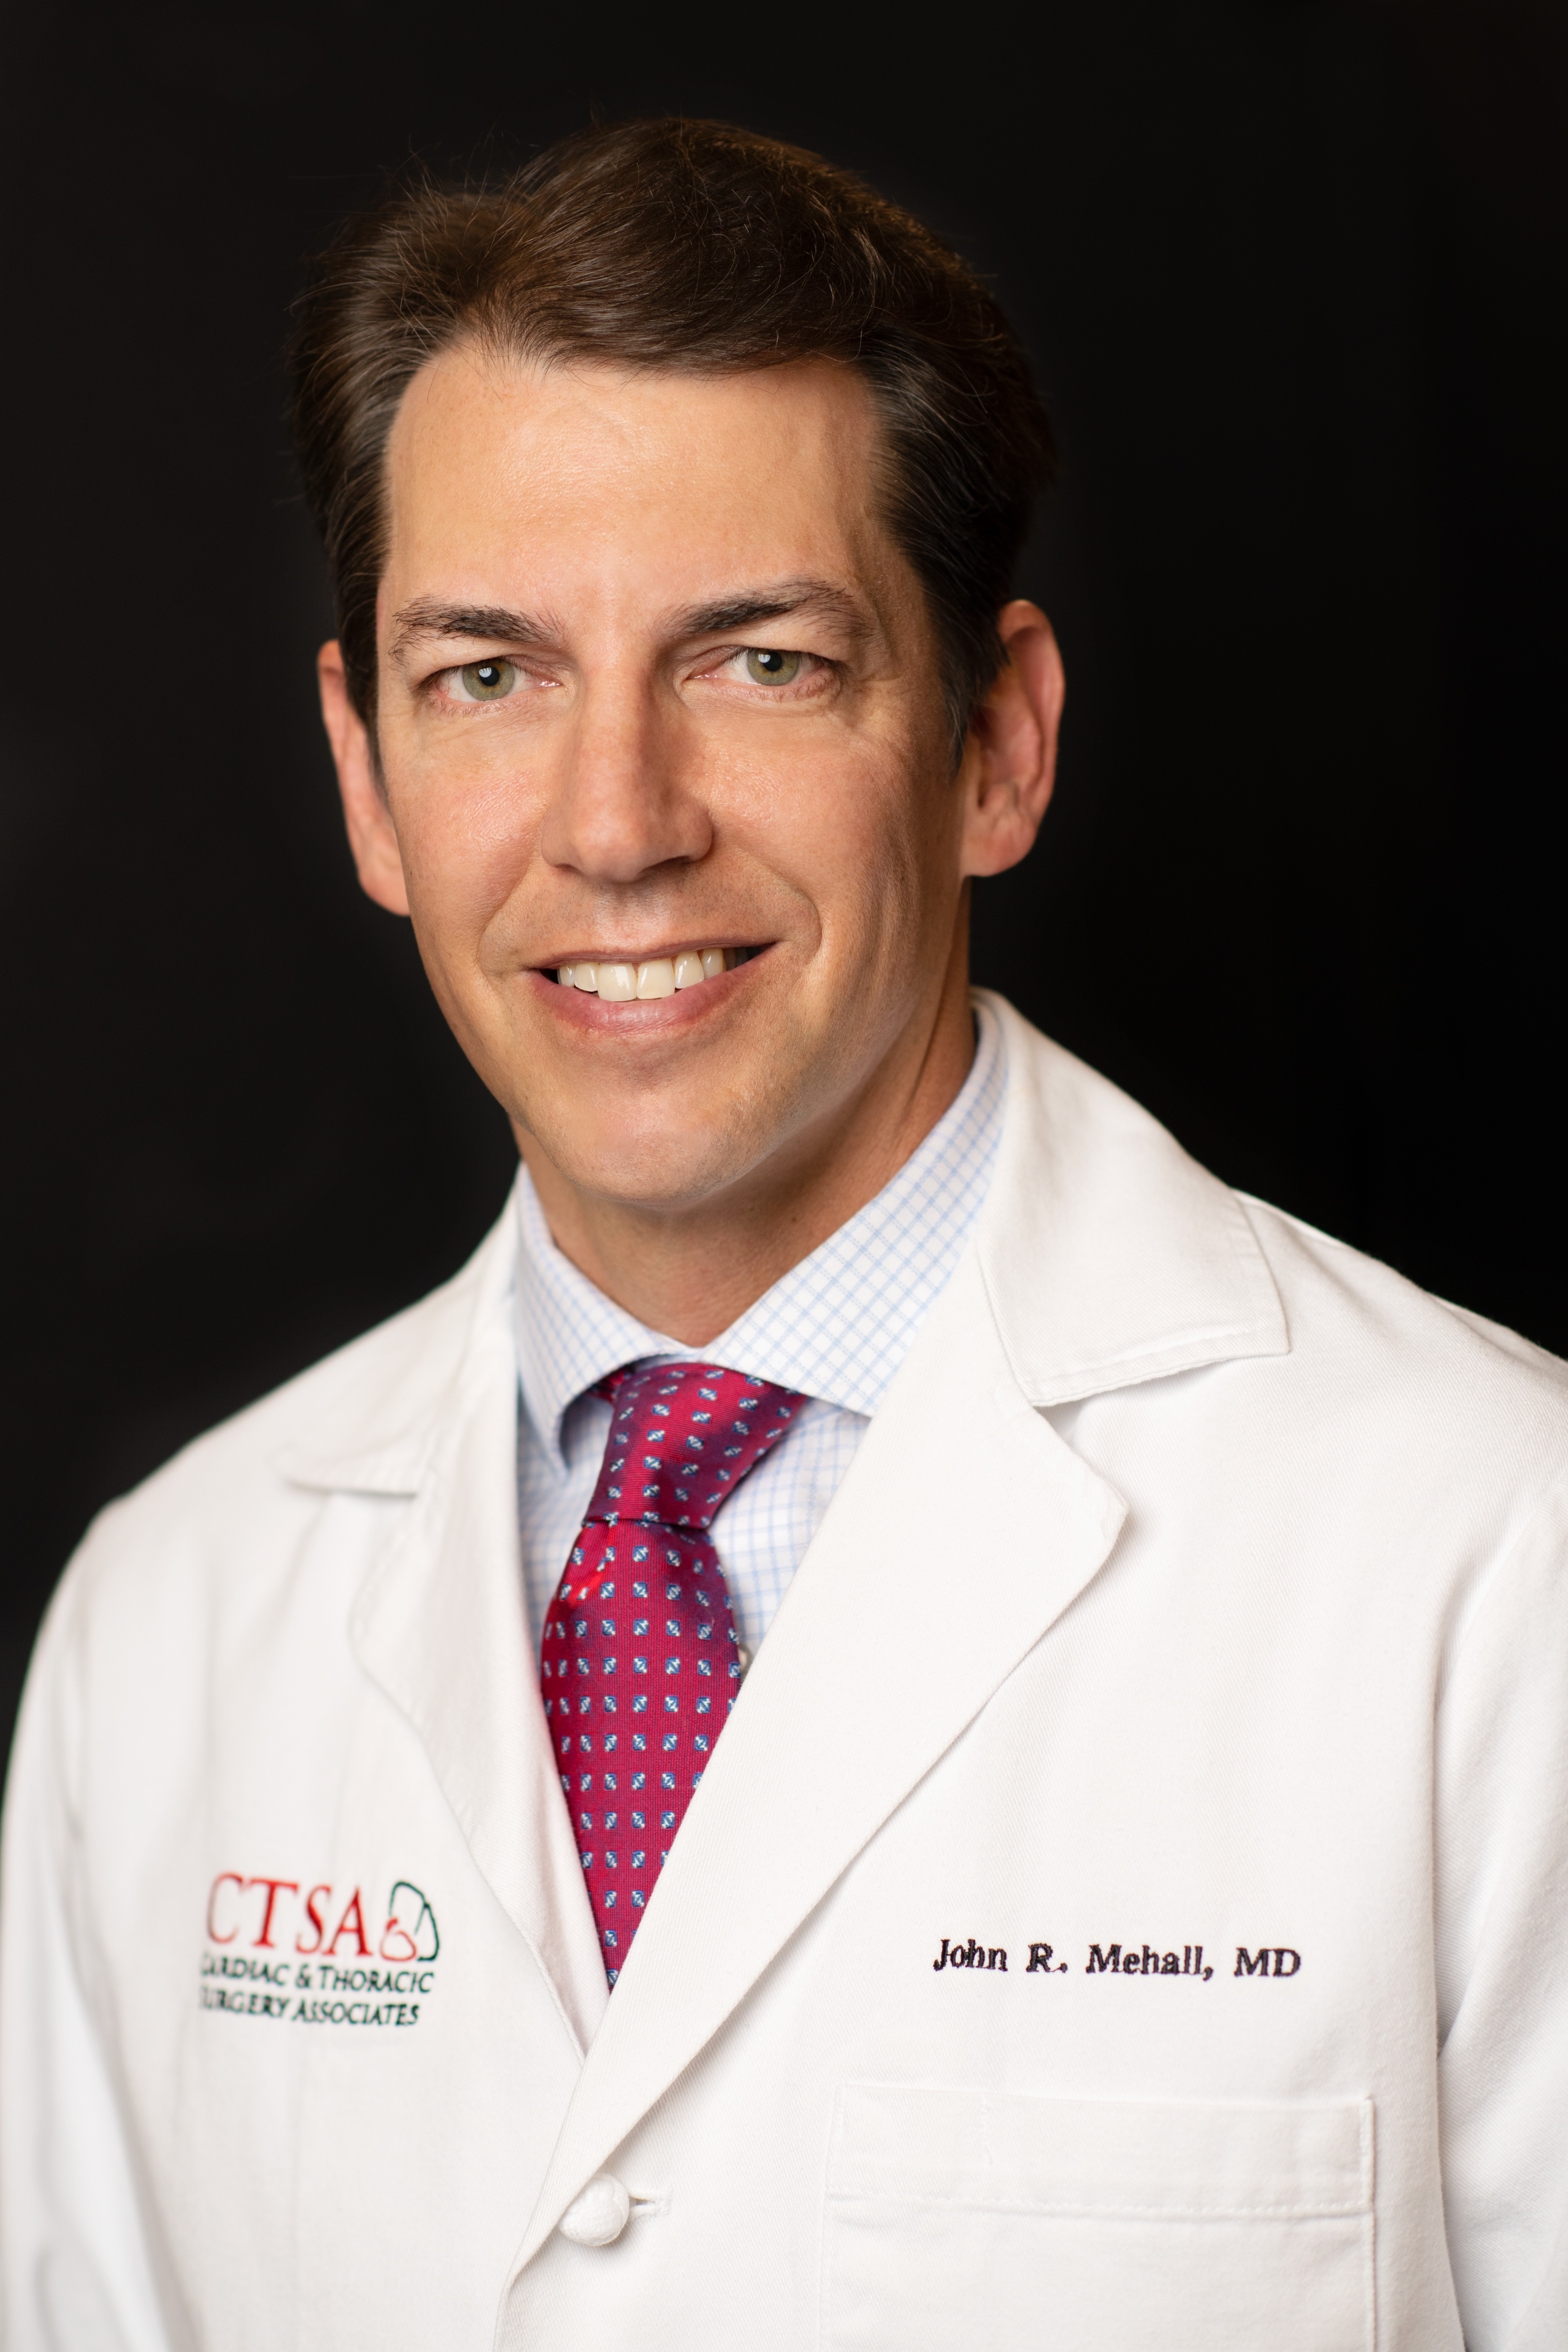 Dr. John Mehall